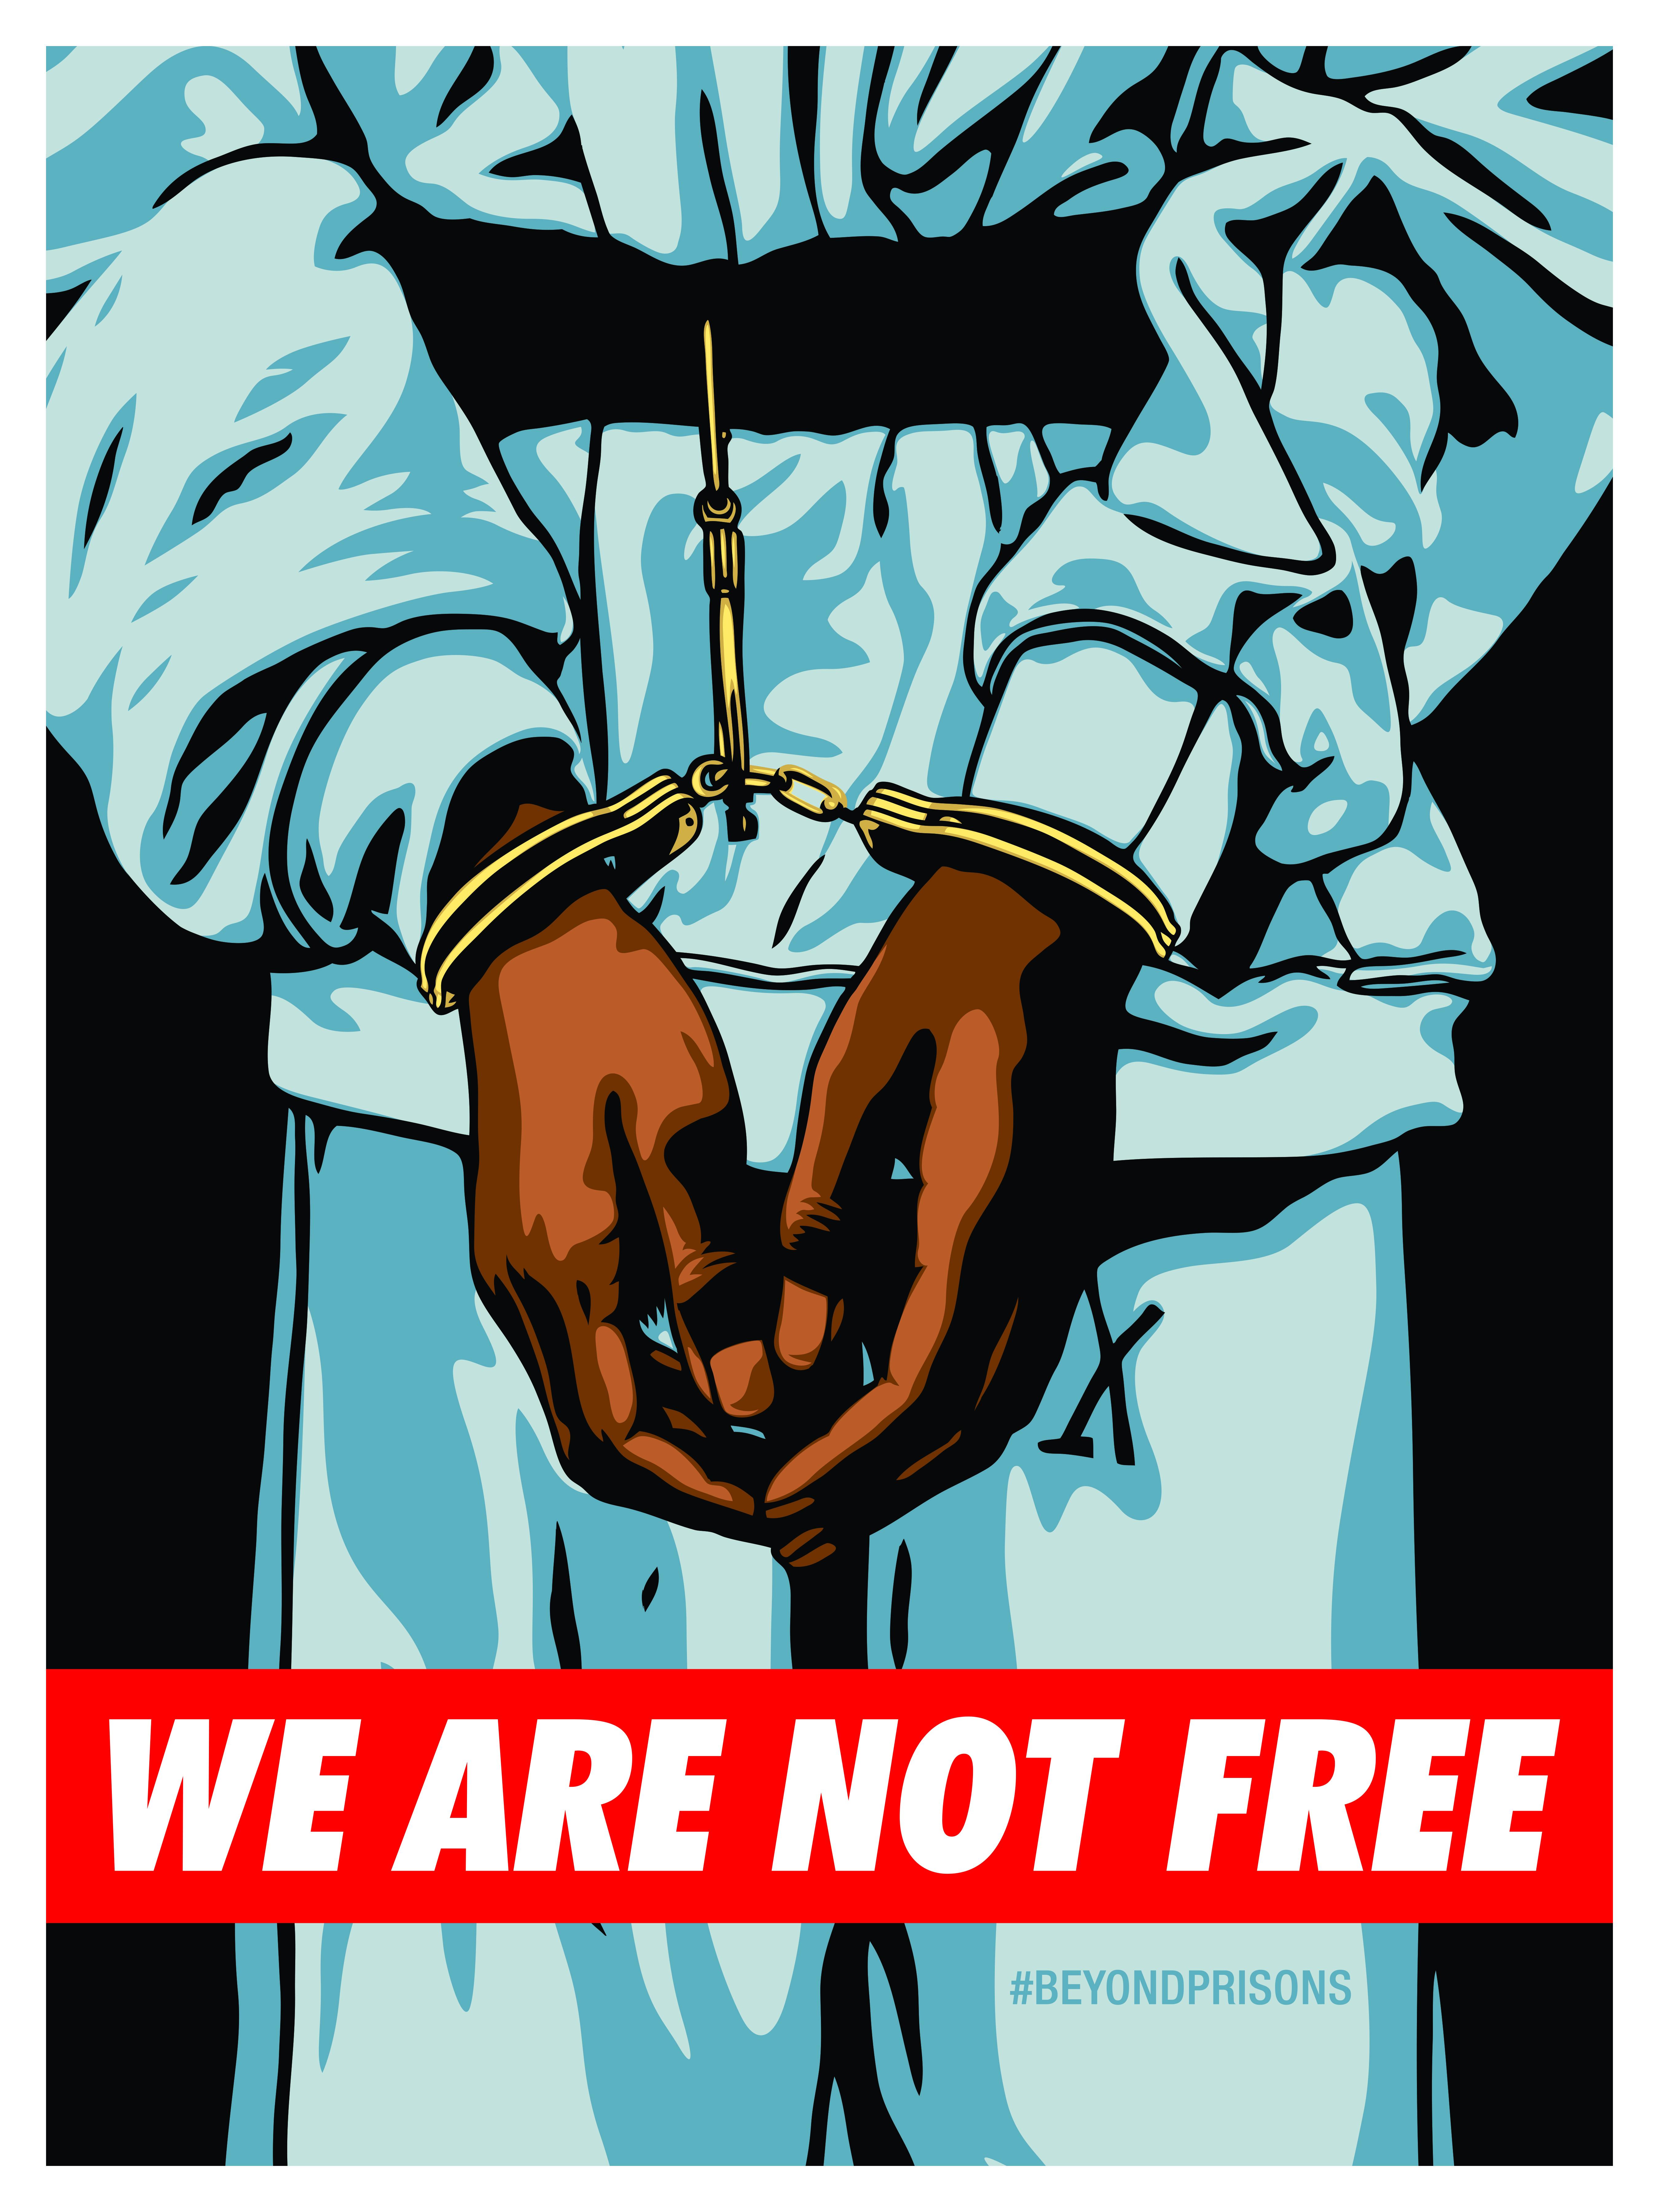 Large_Yerena_WeAreNotFree_Prisons_Amplifier-1.jpg